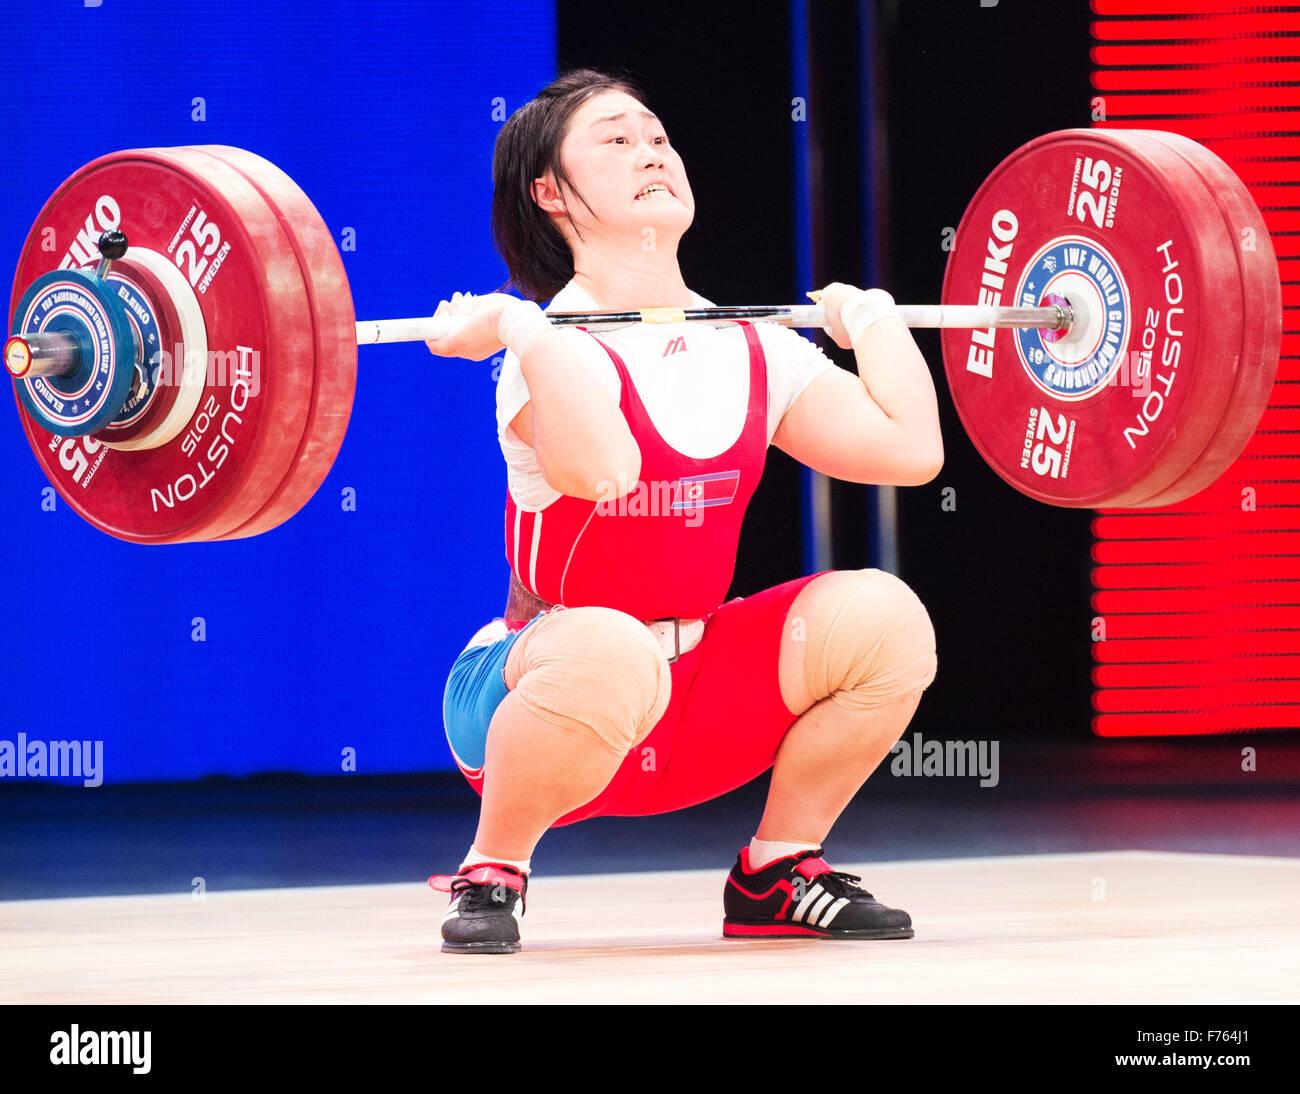 Houston, Texas, USA. 25Th Nov, 2015. Choe Hyo Sim de la Corée du Nord 139 kilogrammes dans les ascenseurs du Photo Stock